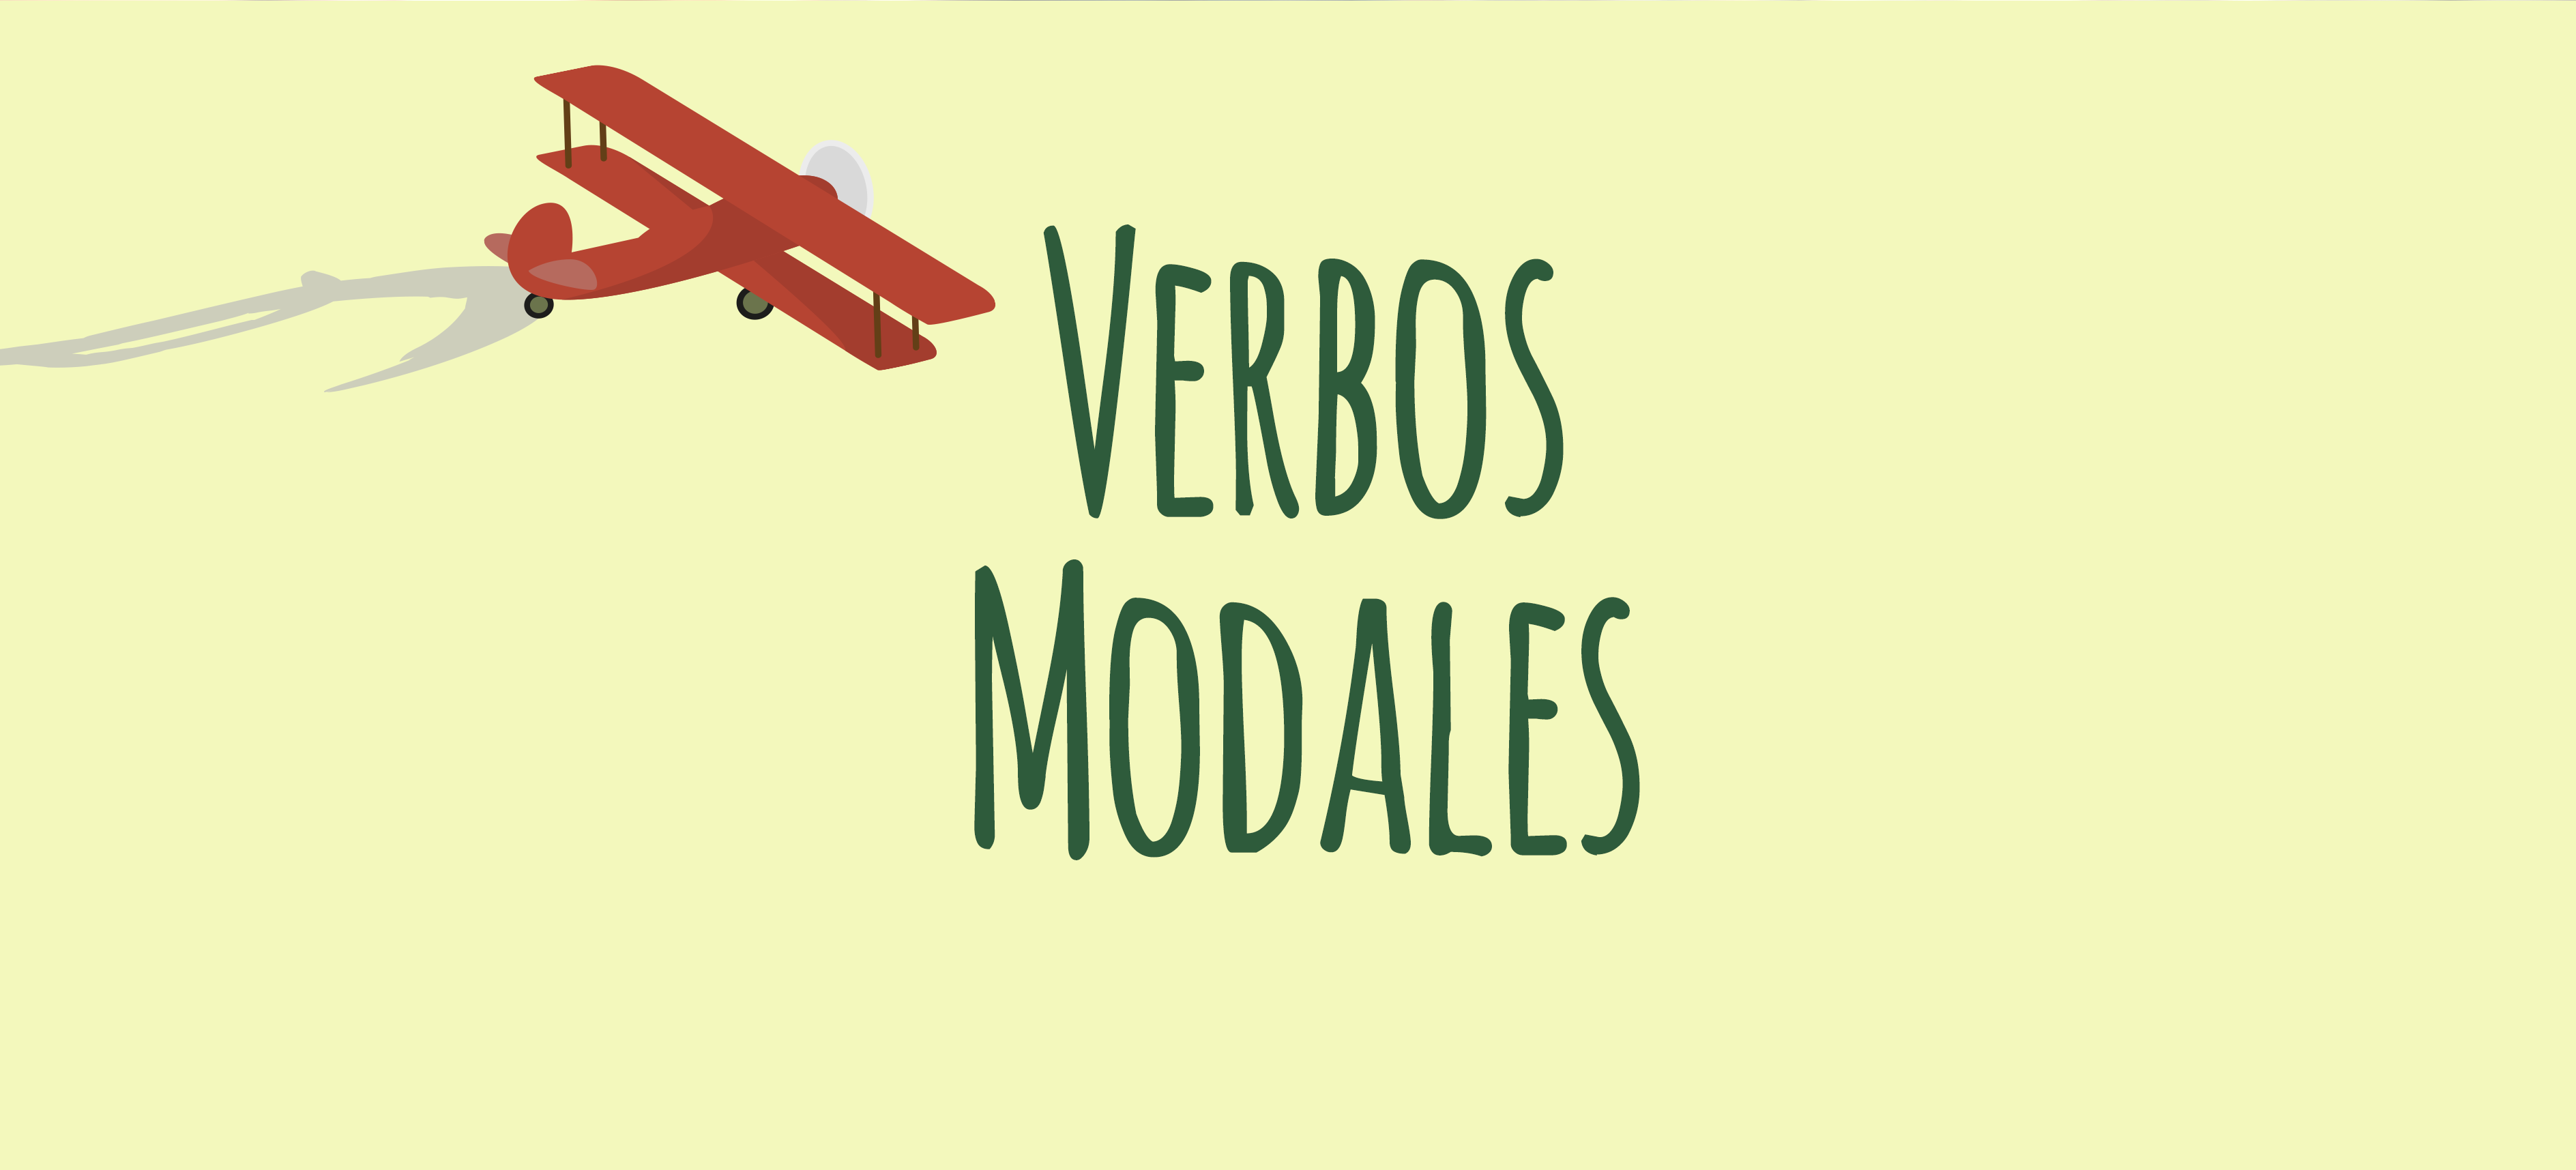 verbos-modales